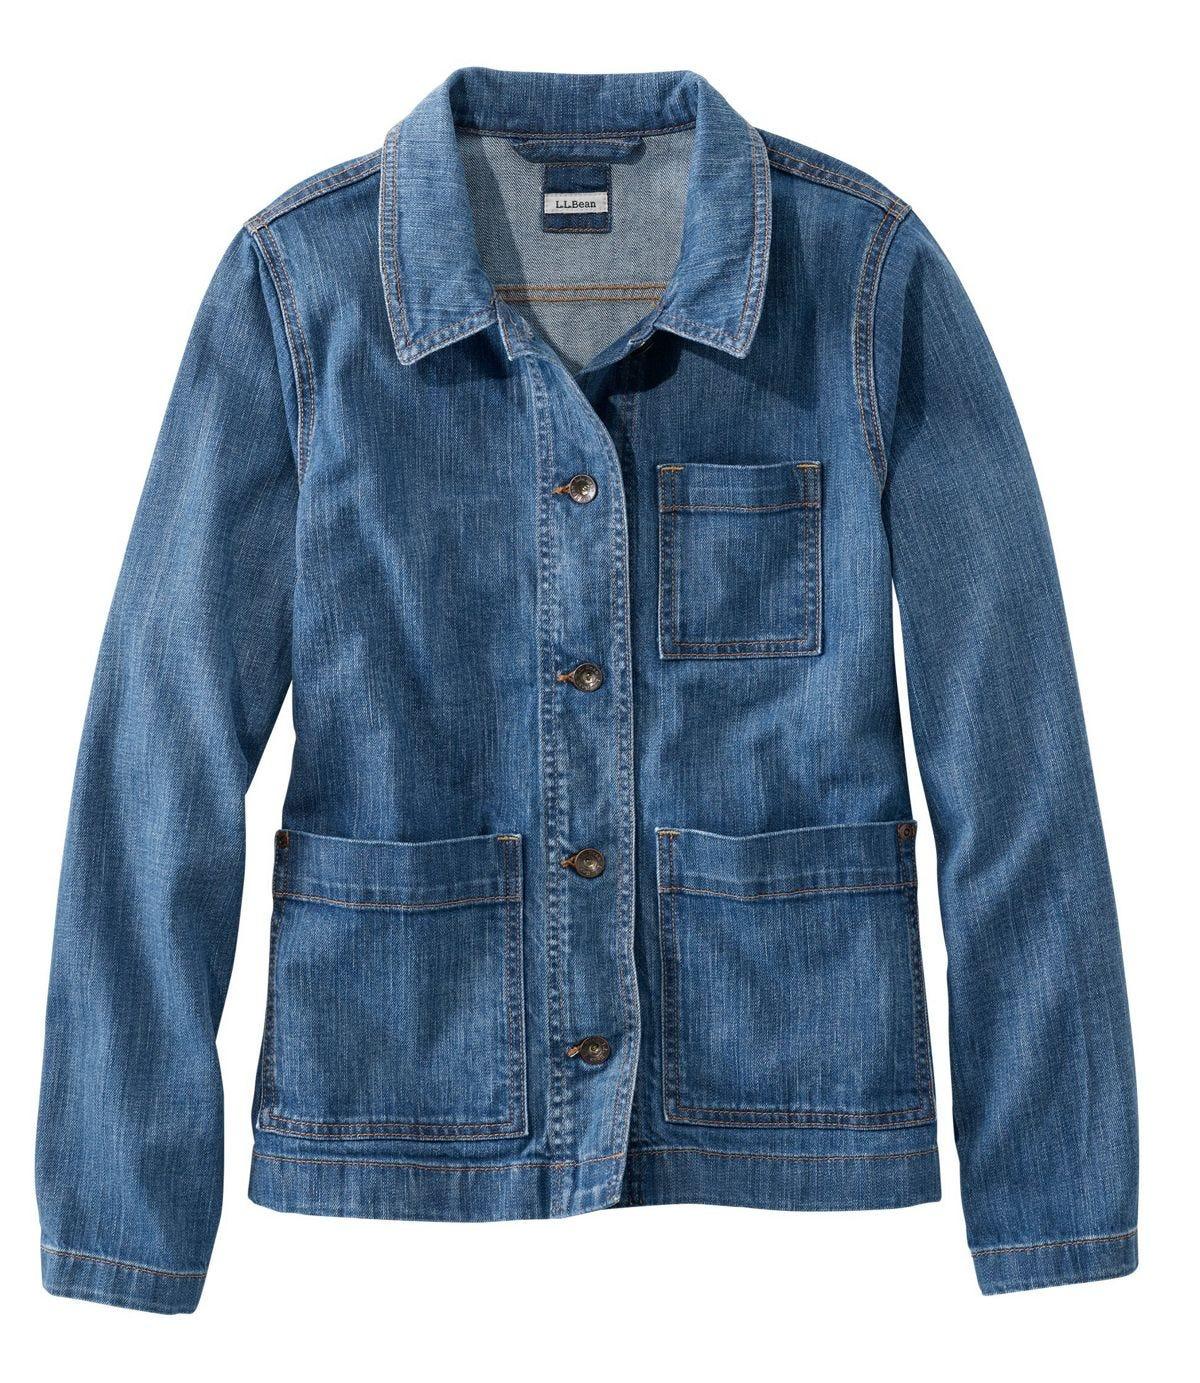 a4e25970416 Everlane Chore Jacket Women s Launch - Spring Fashion